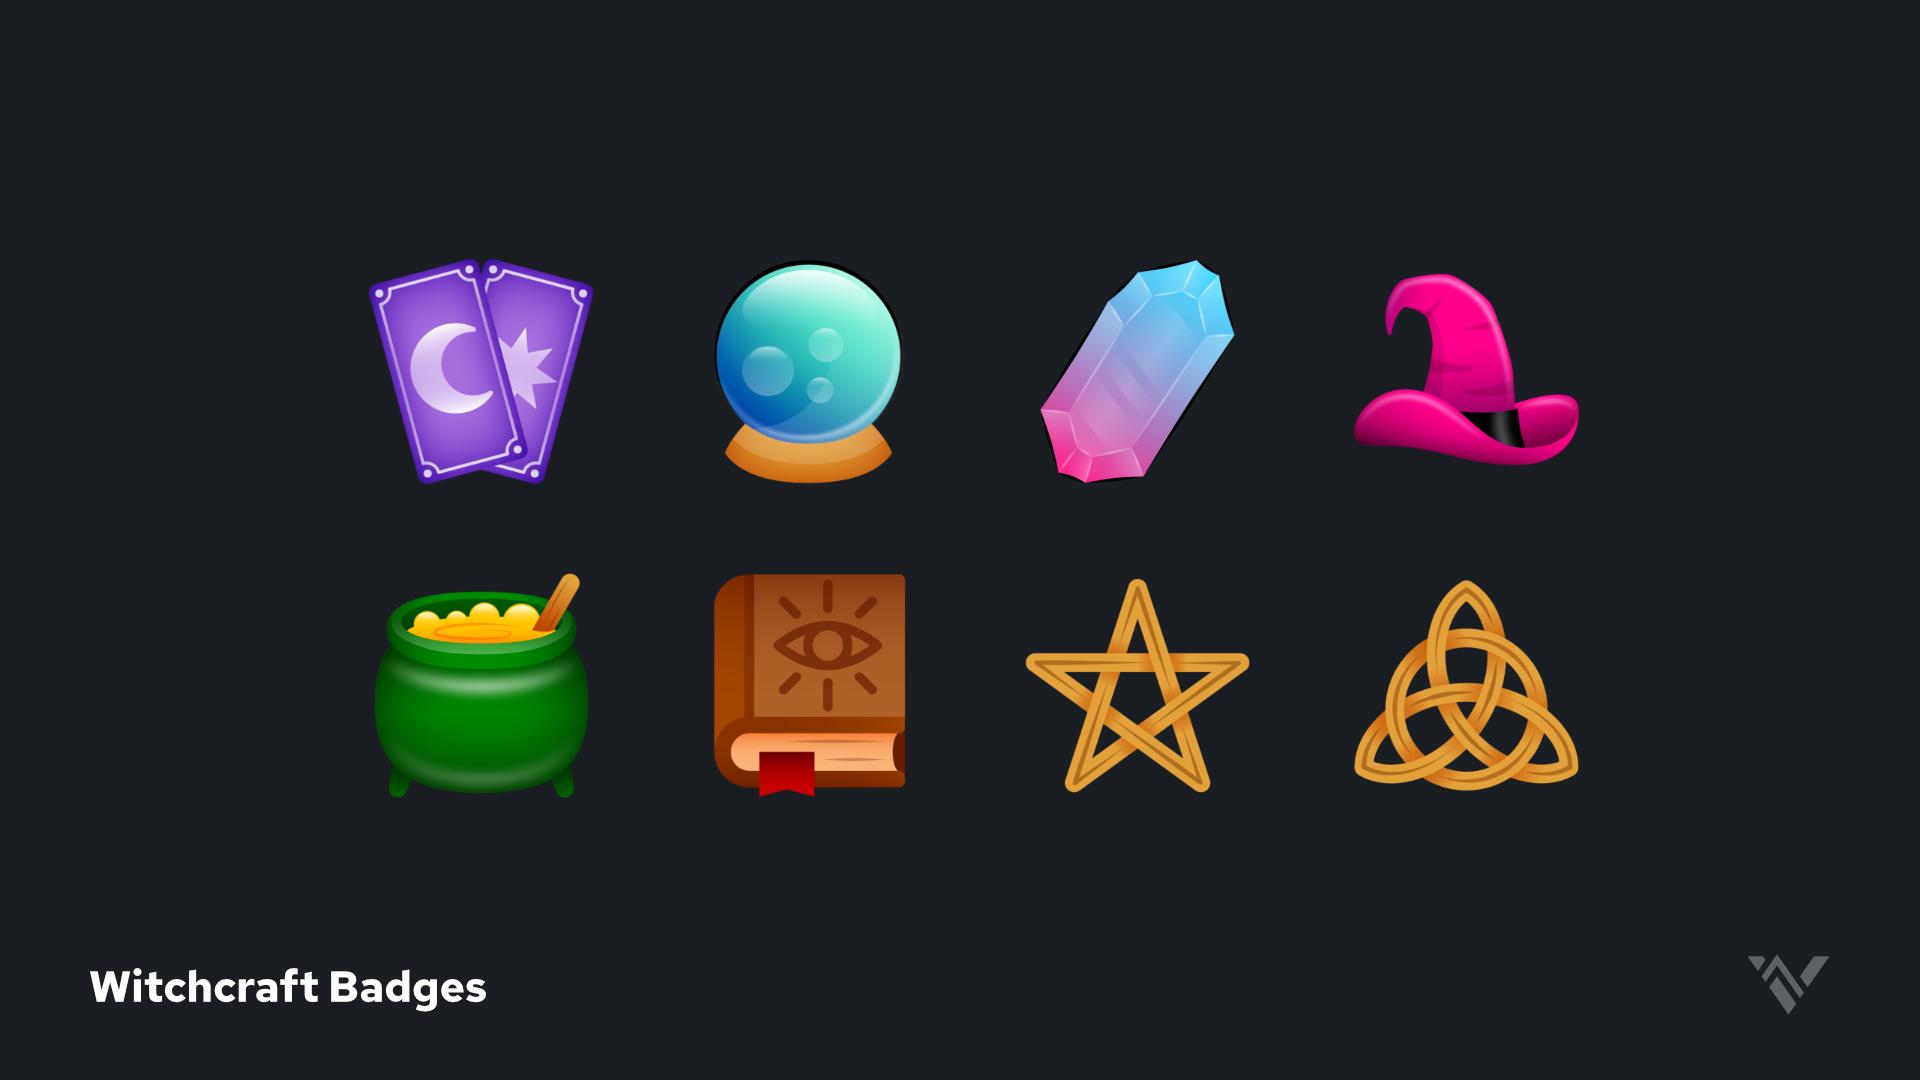 Witchcraft Badges Showcase